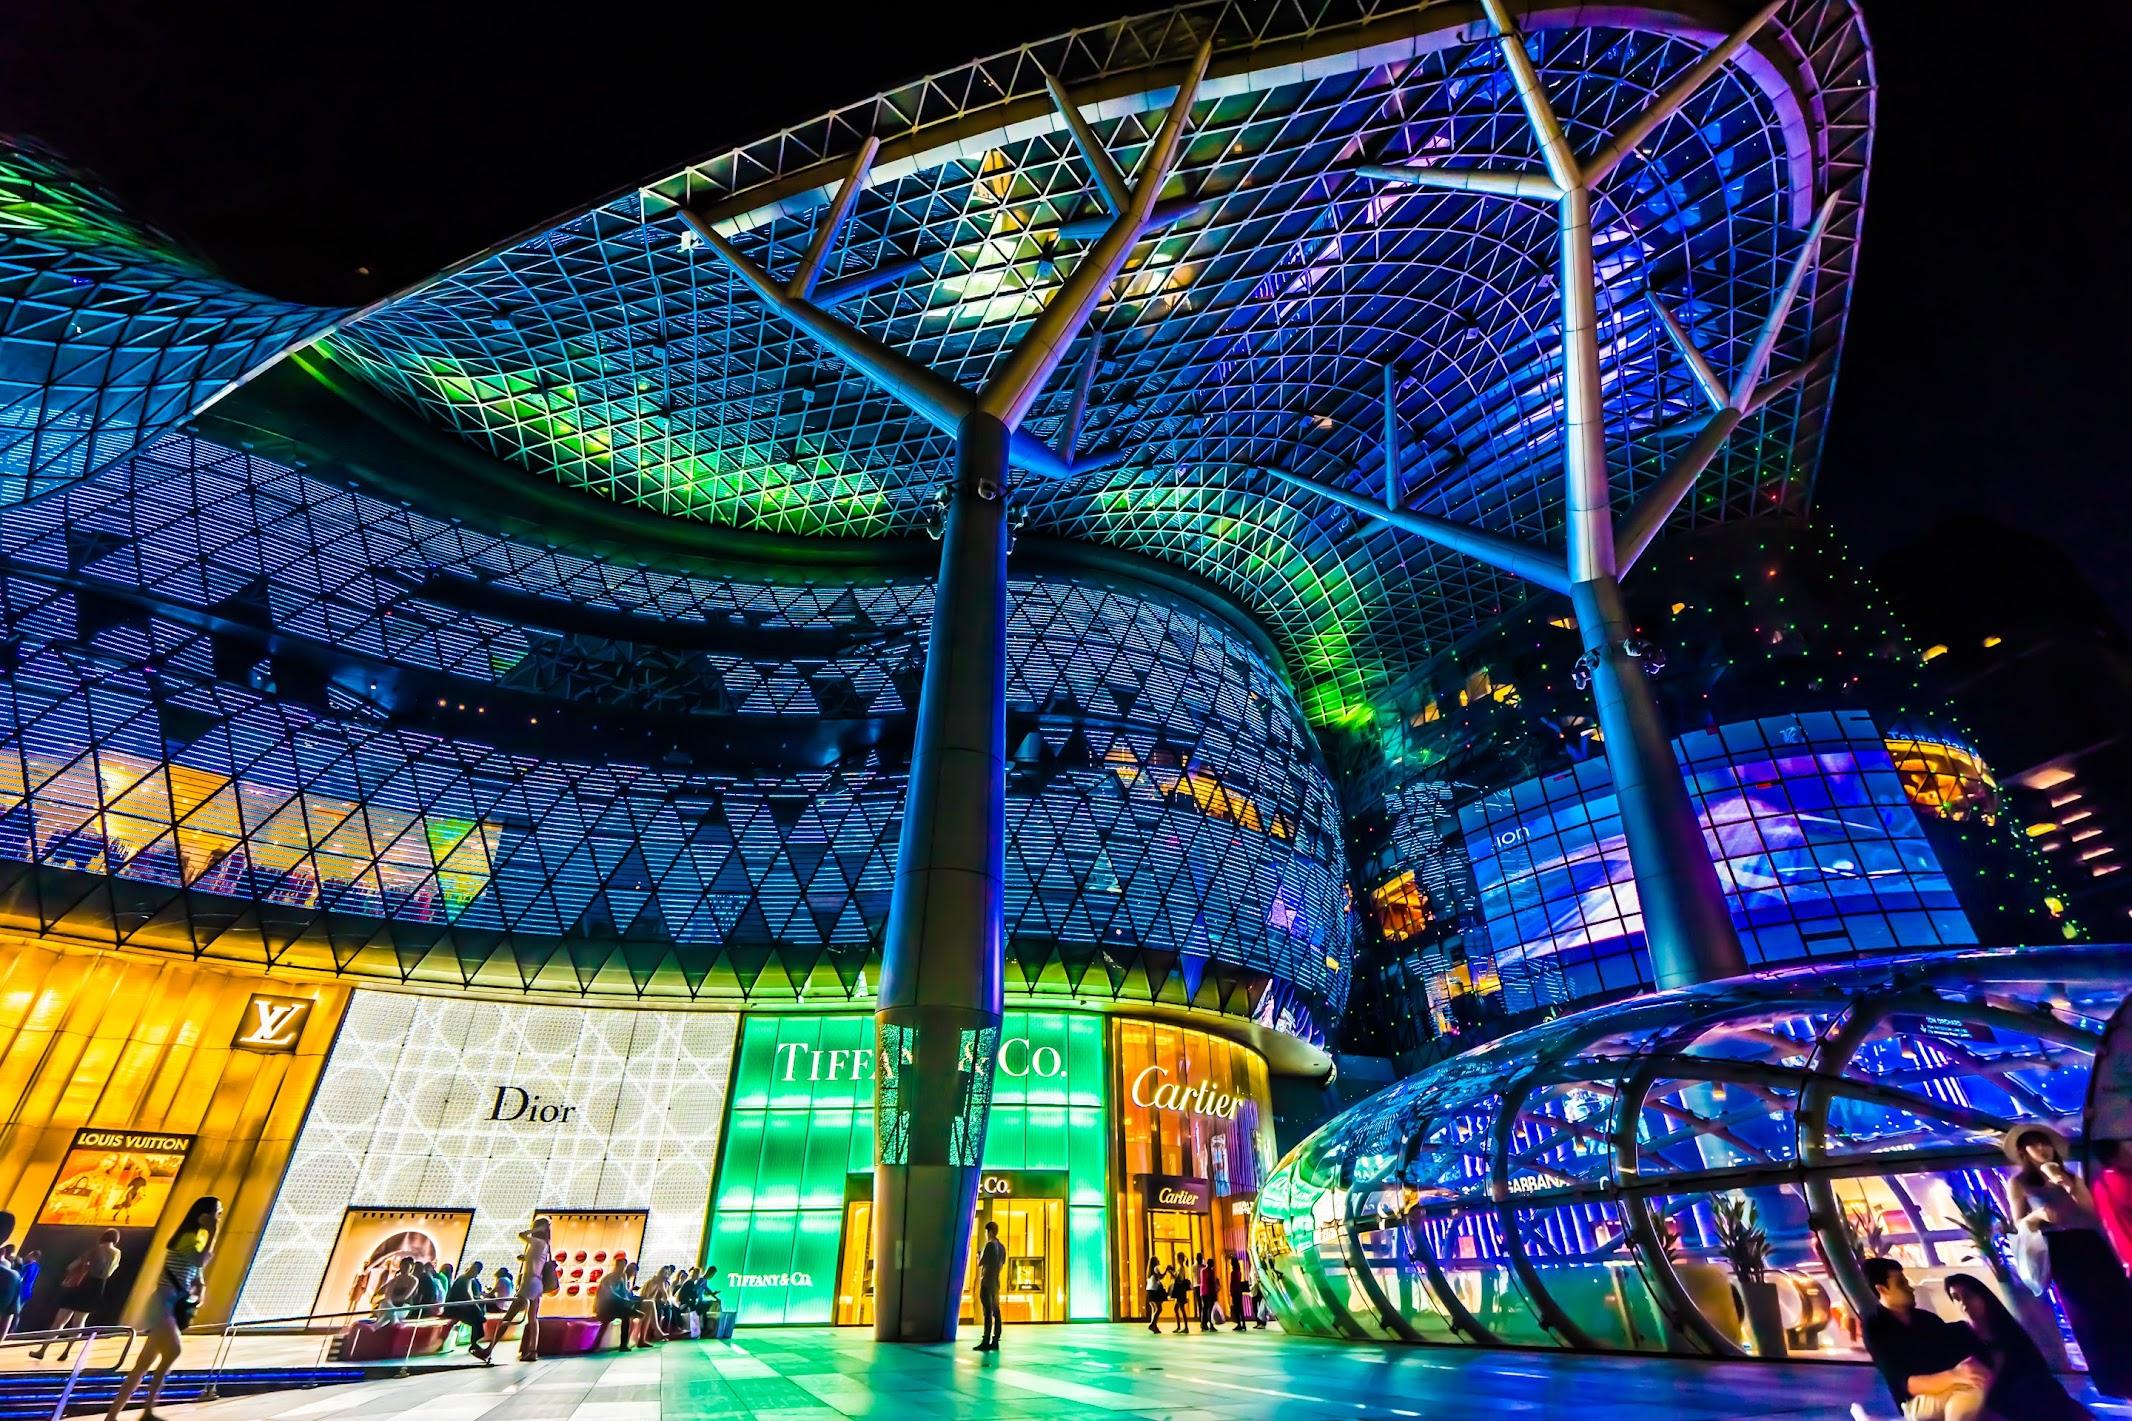 Singapore ION Orchard night view illumination5